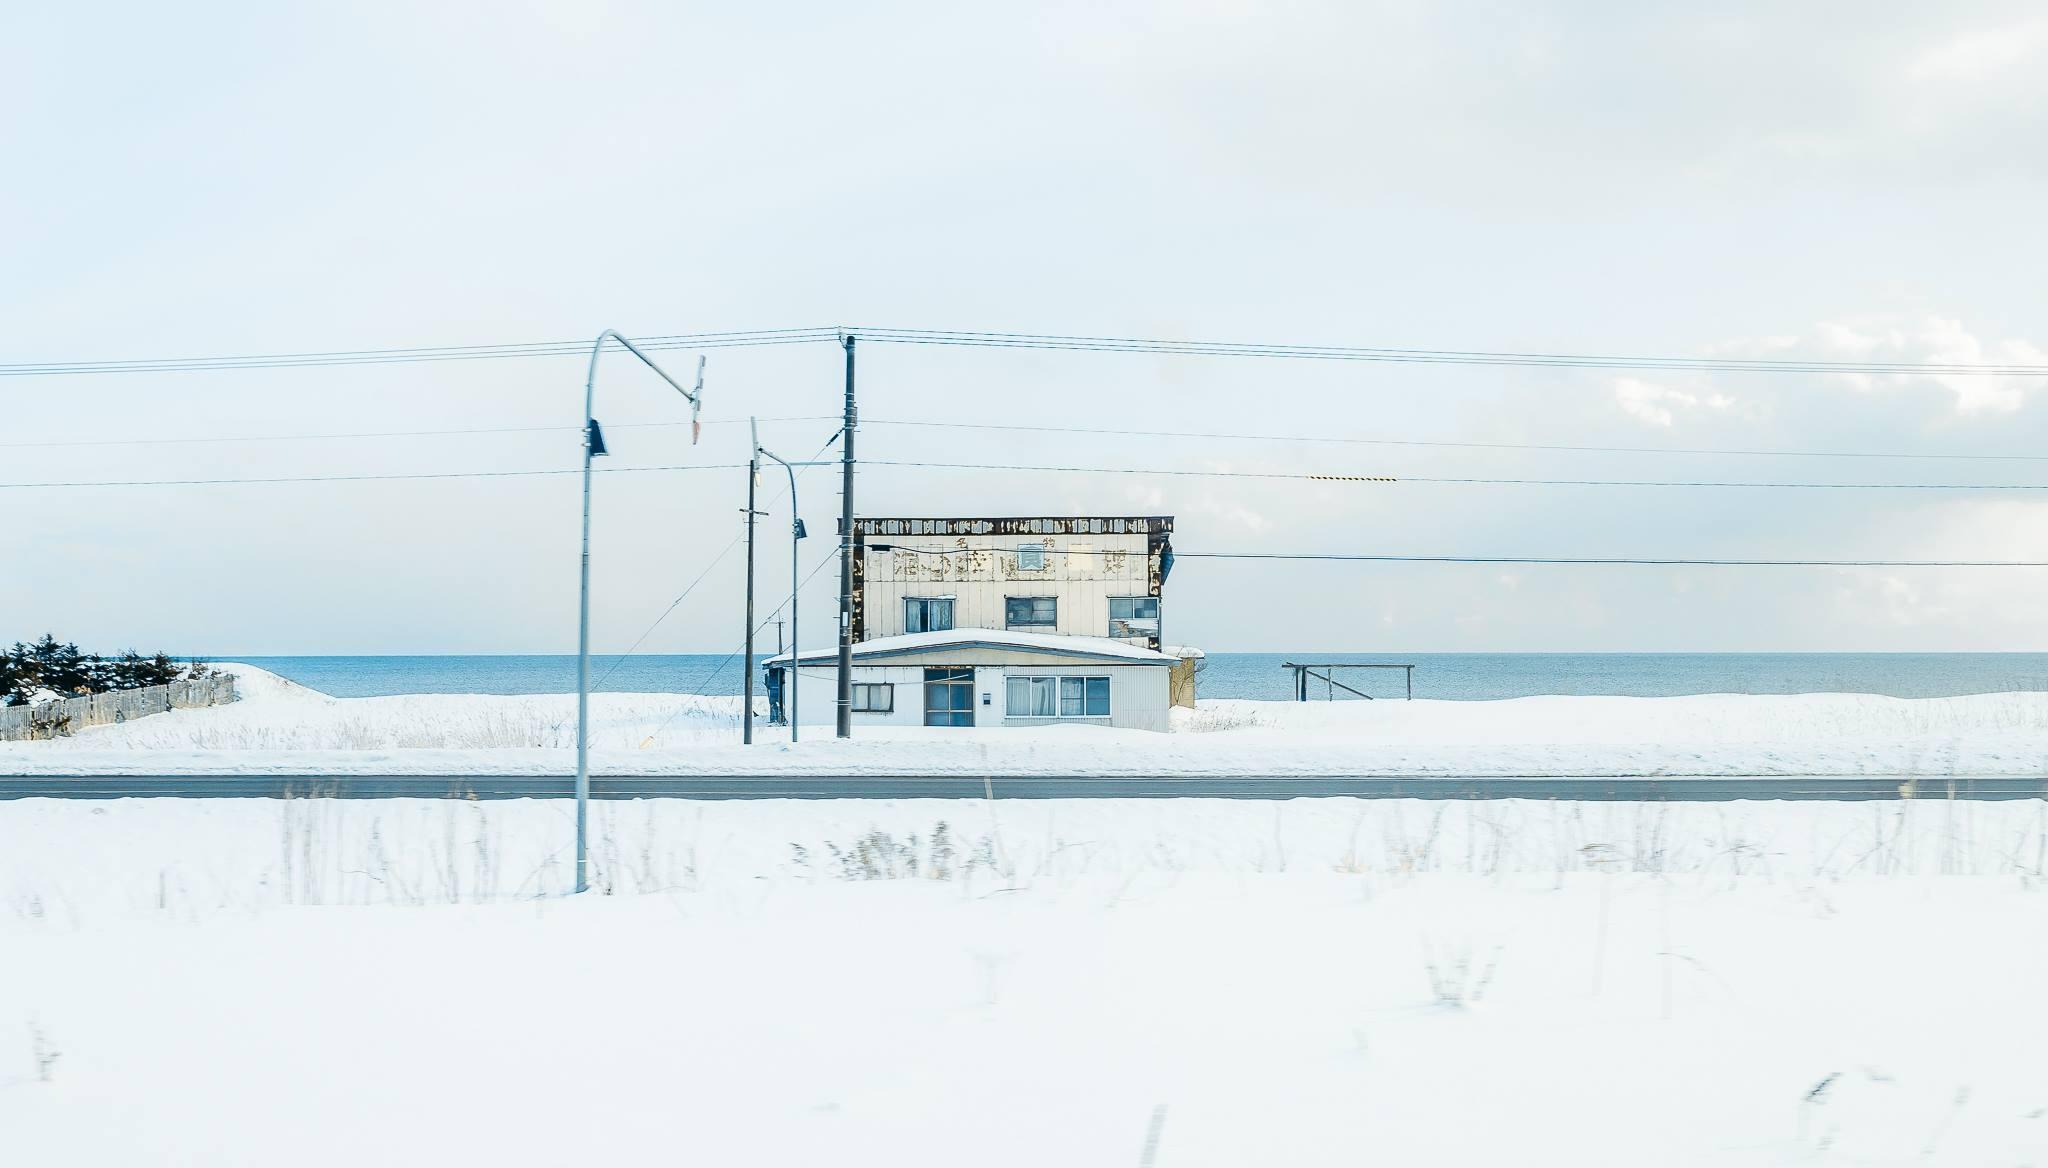 Hokkaido tuyet trang, noi dang den nhat mua dong o Nhat Ban hinh anh 8